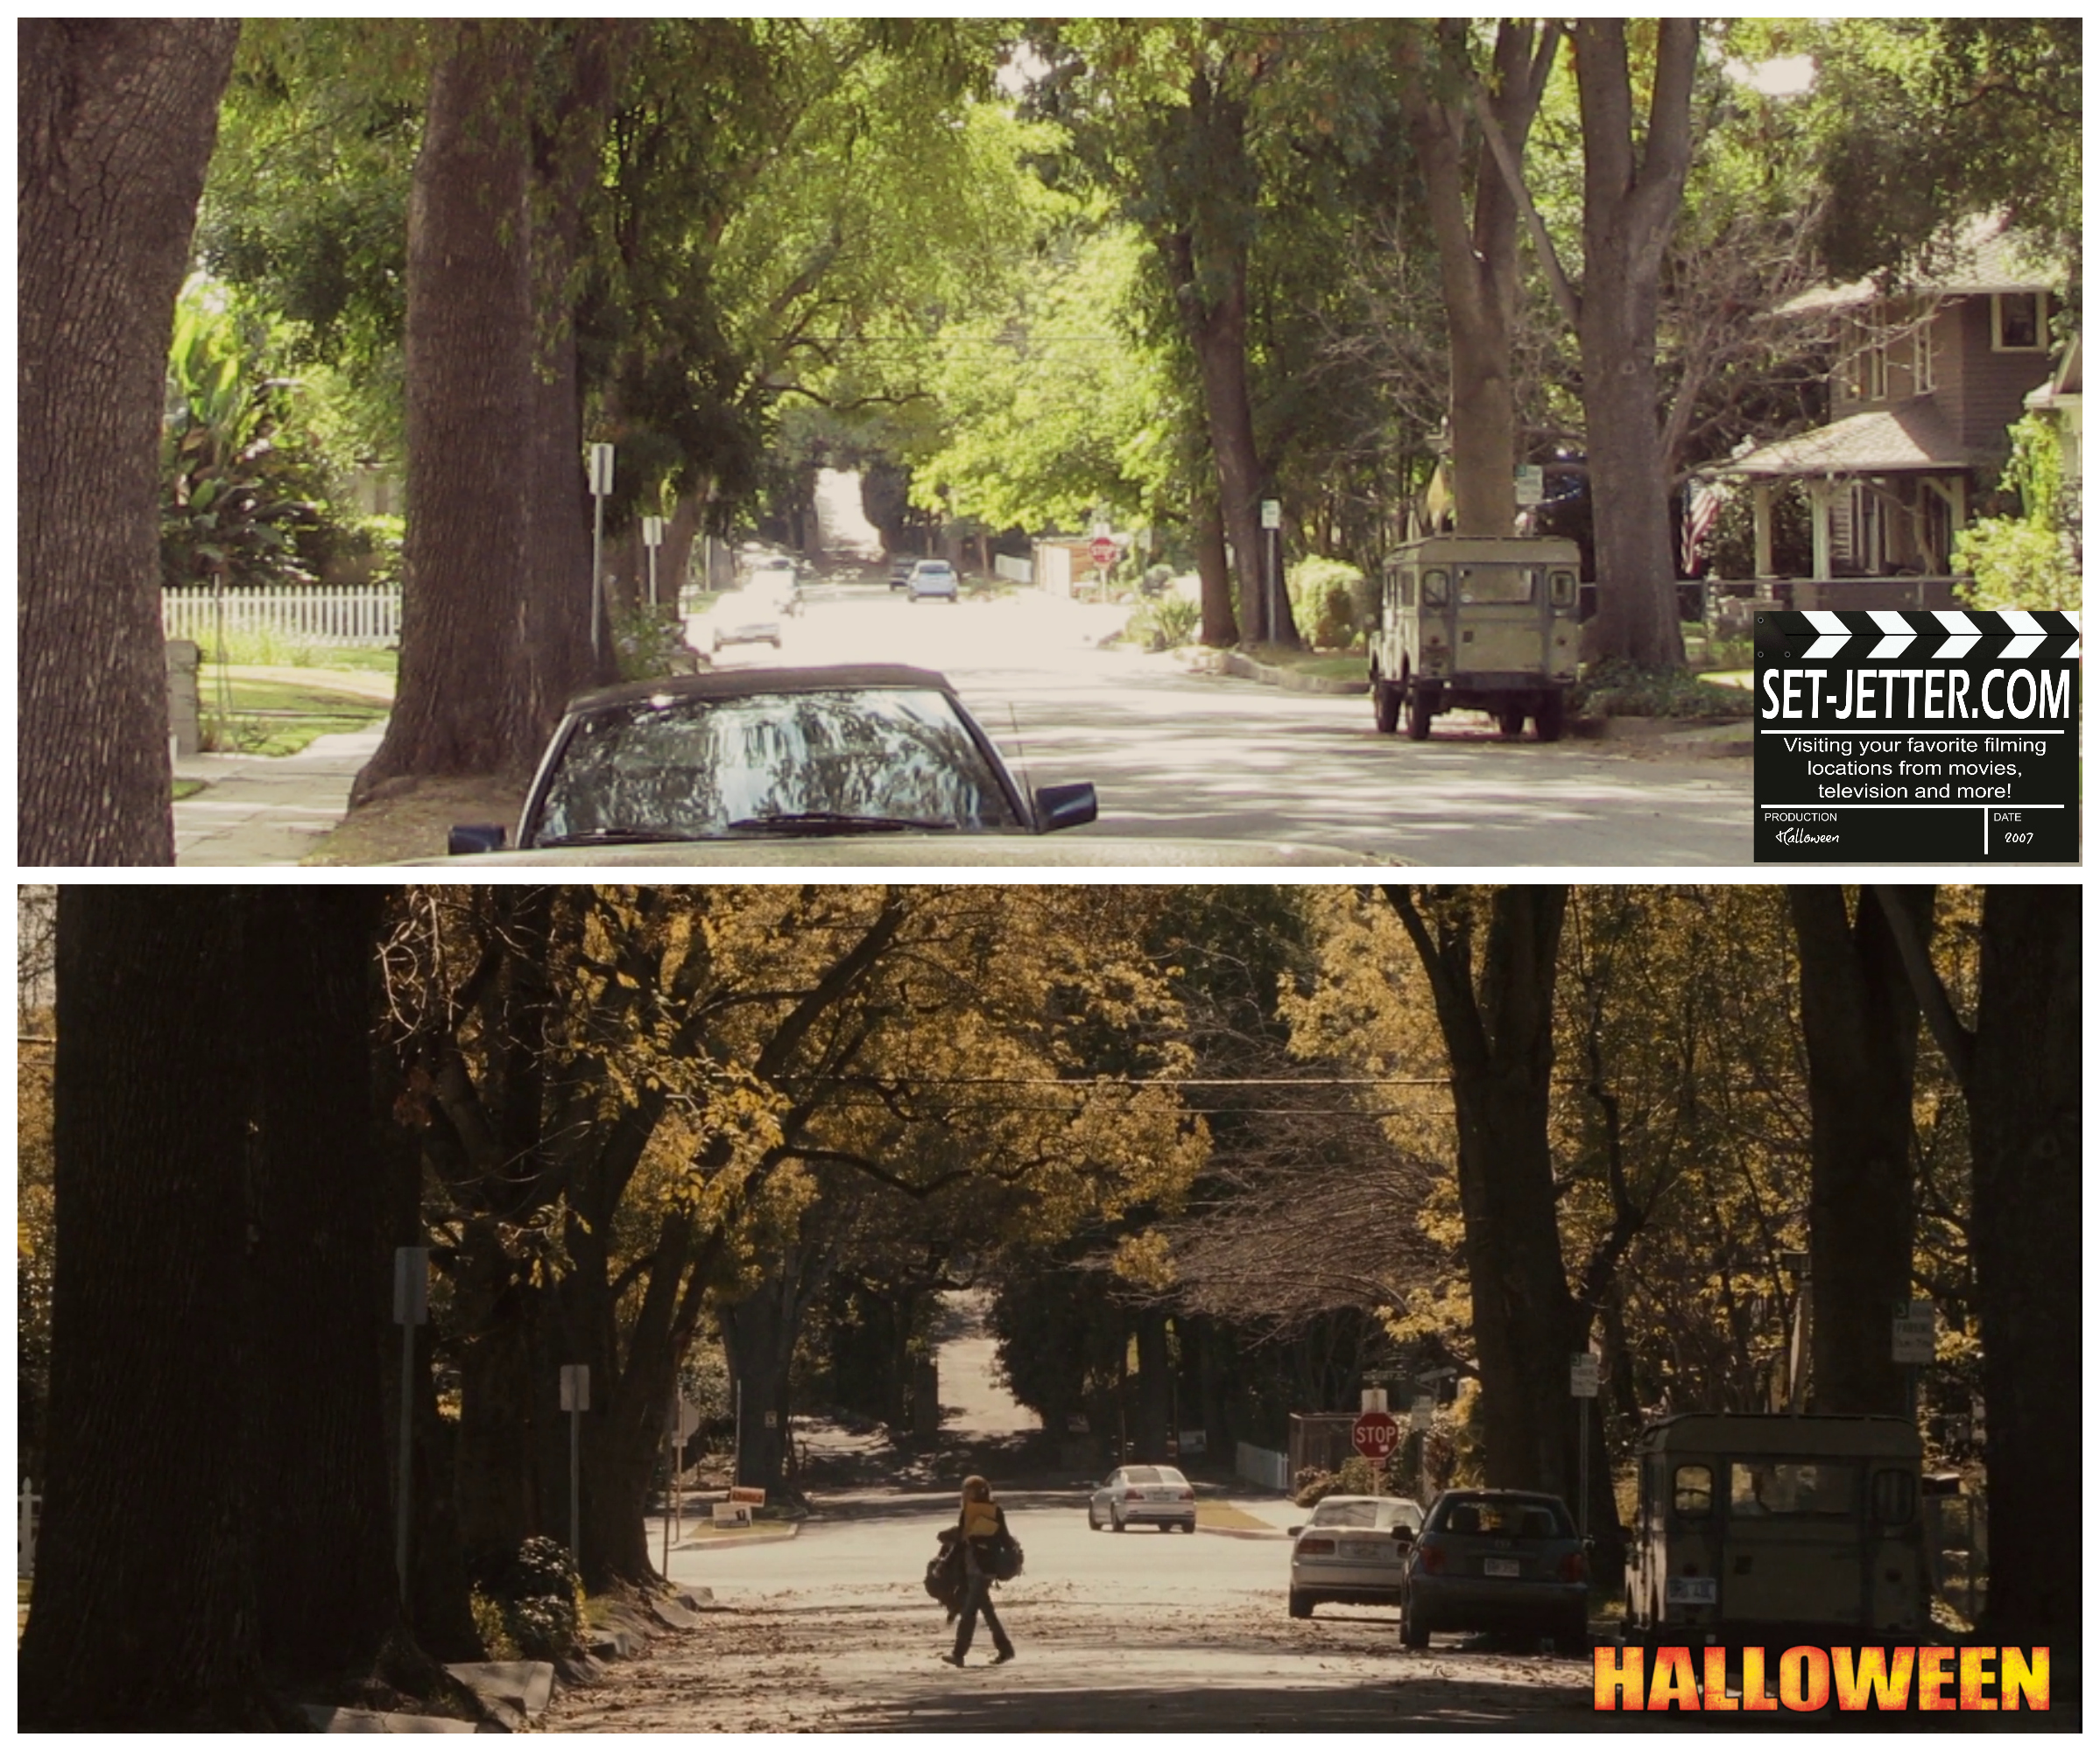 Halloween 2007 comparison 10.jpg